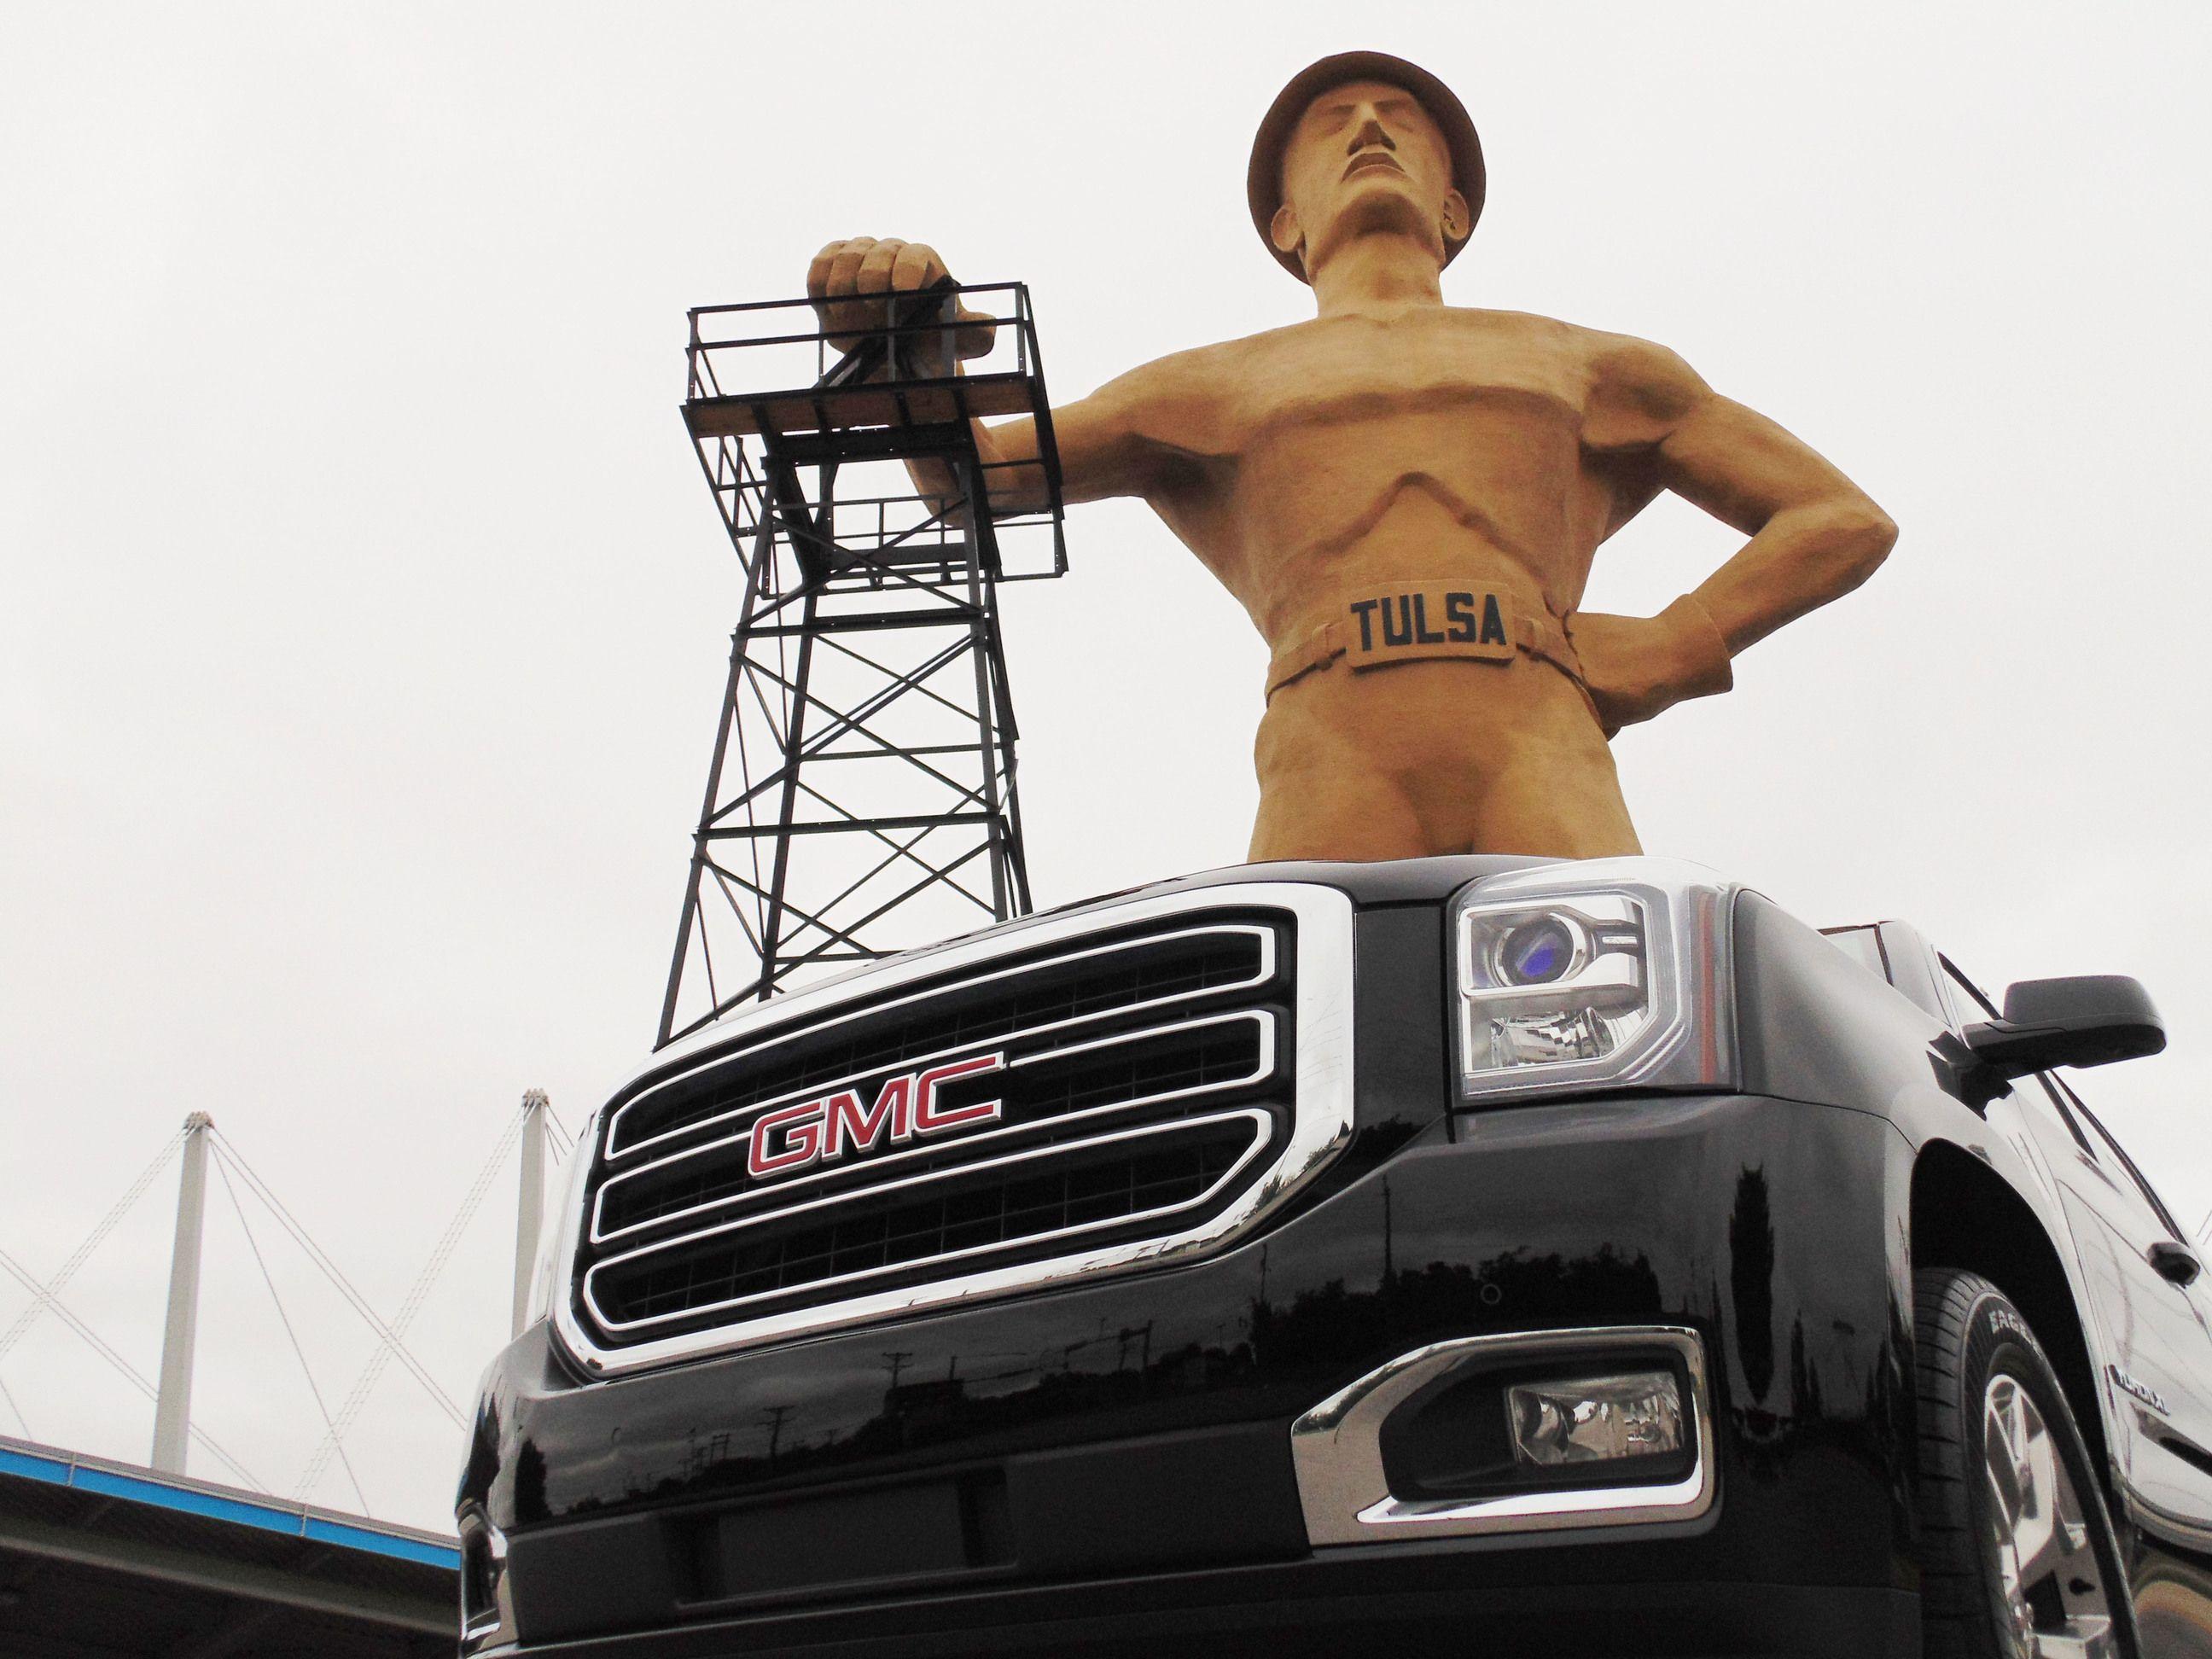 2015 Gmc Yukon Next To The Tulsa Golden Driller Tulsa